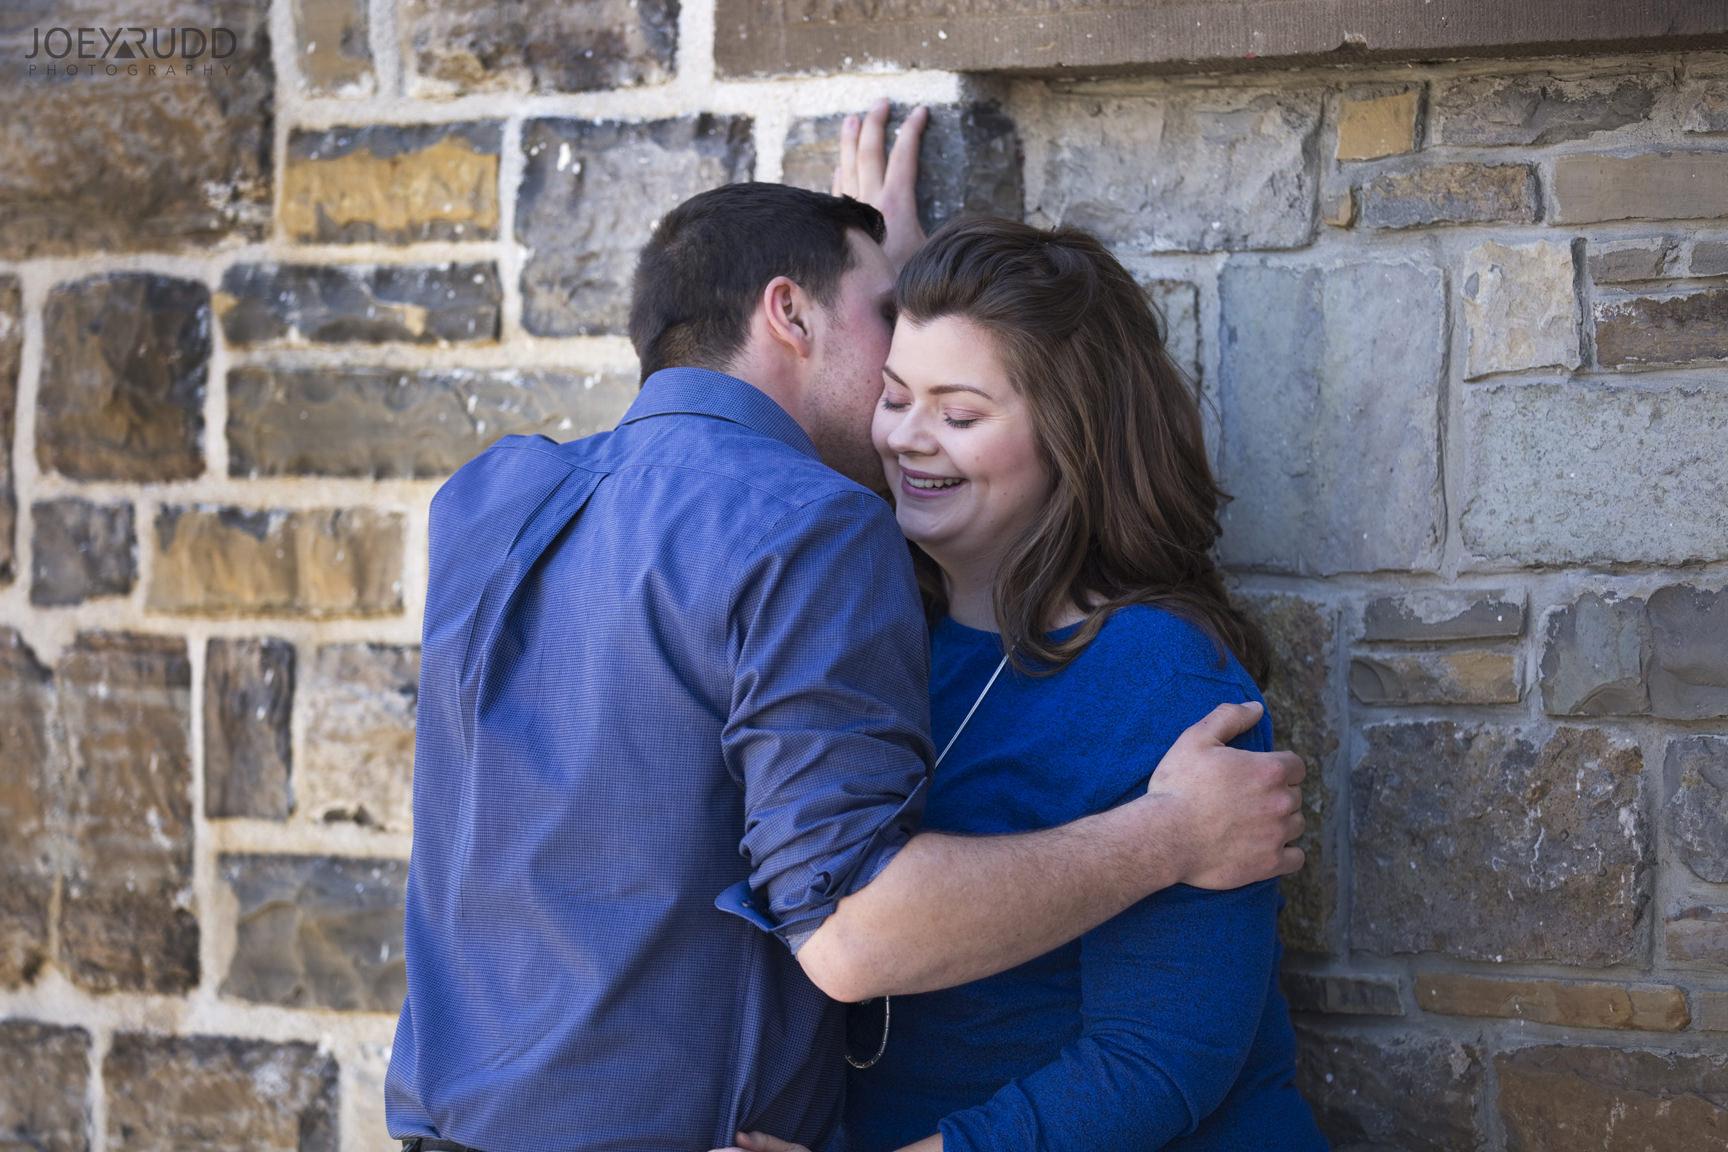 Almonte engagement photography by ottawa wedding photographer joey rudd photography stone wall